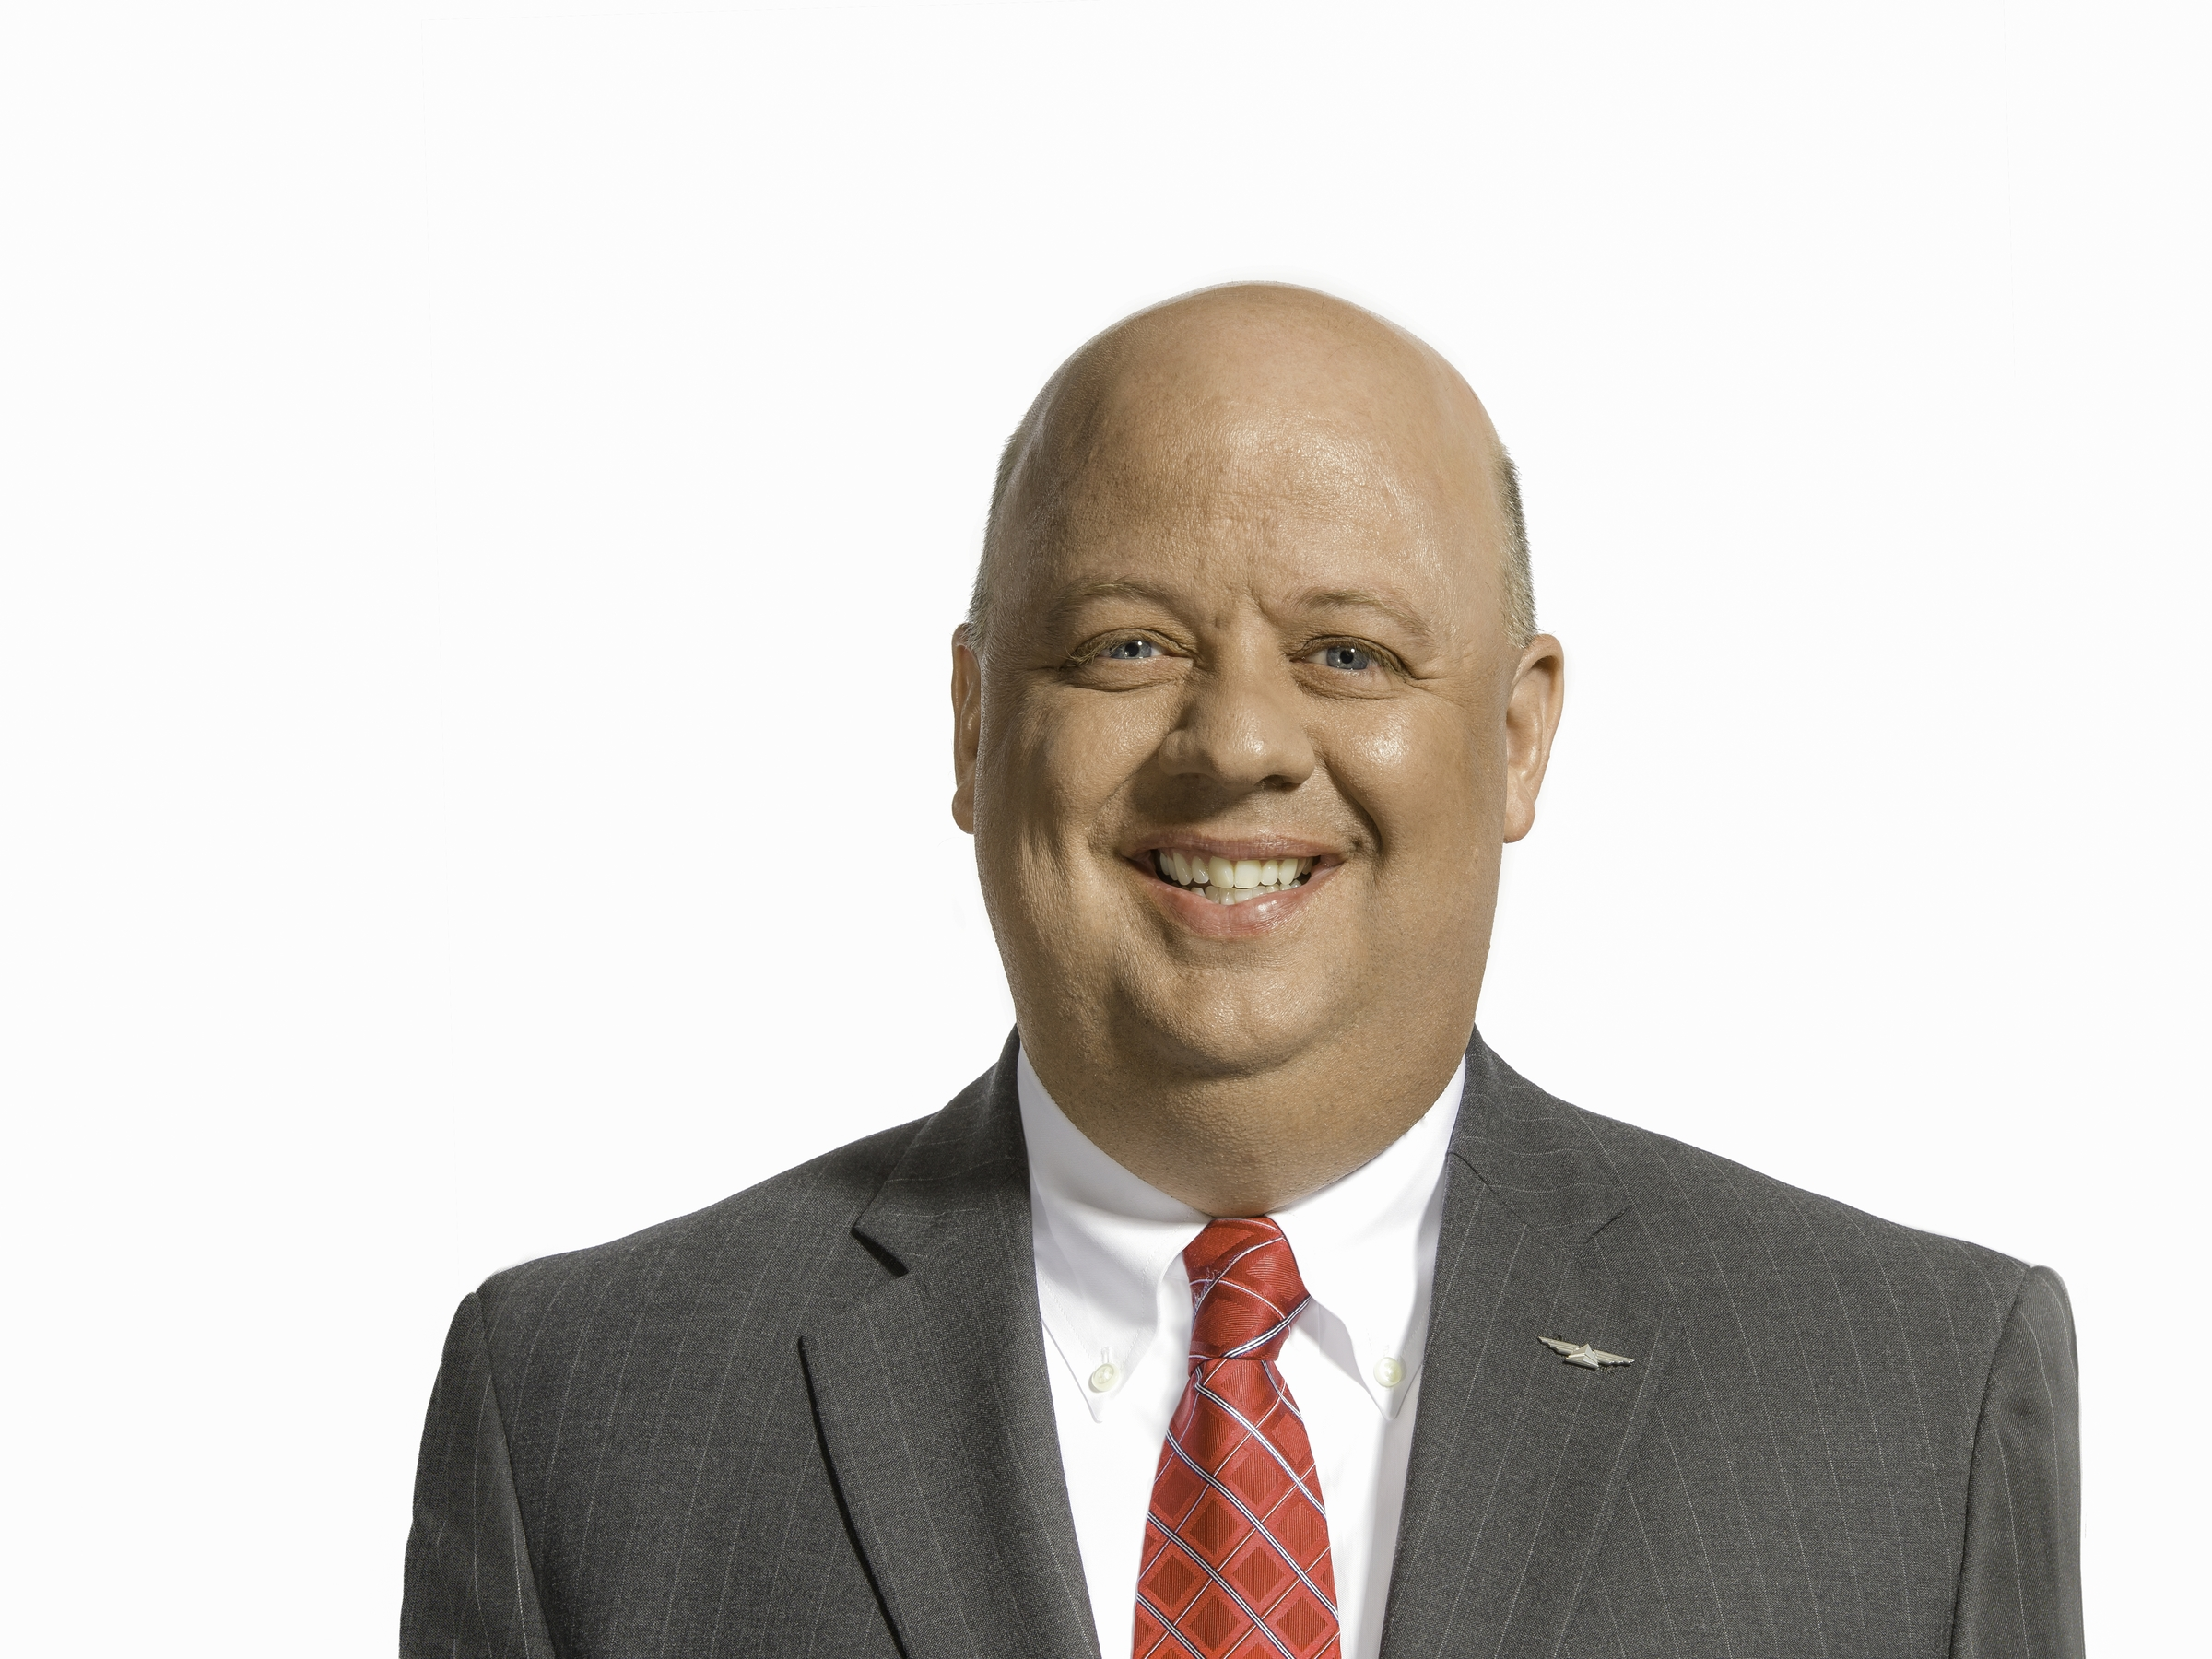 Paul Jacobson Executive Headshot